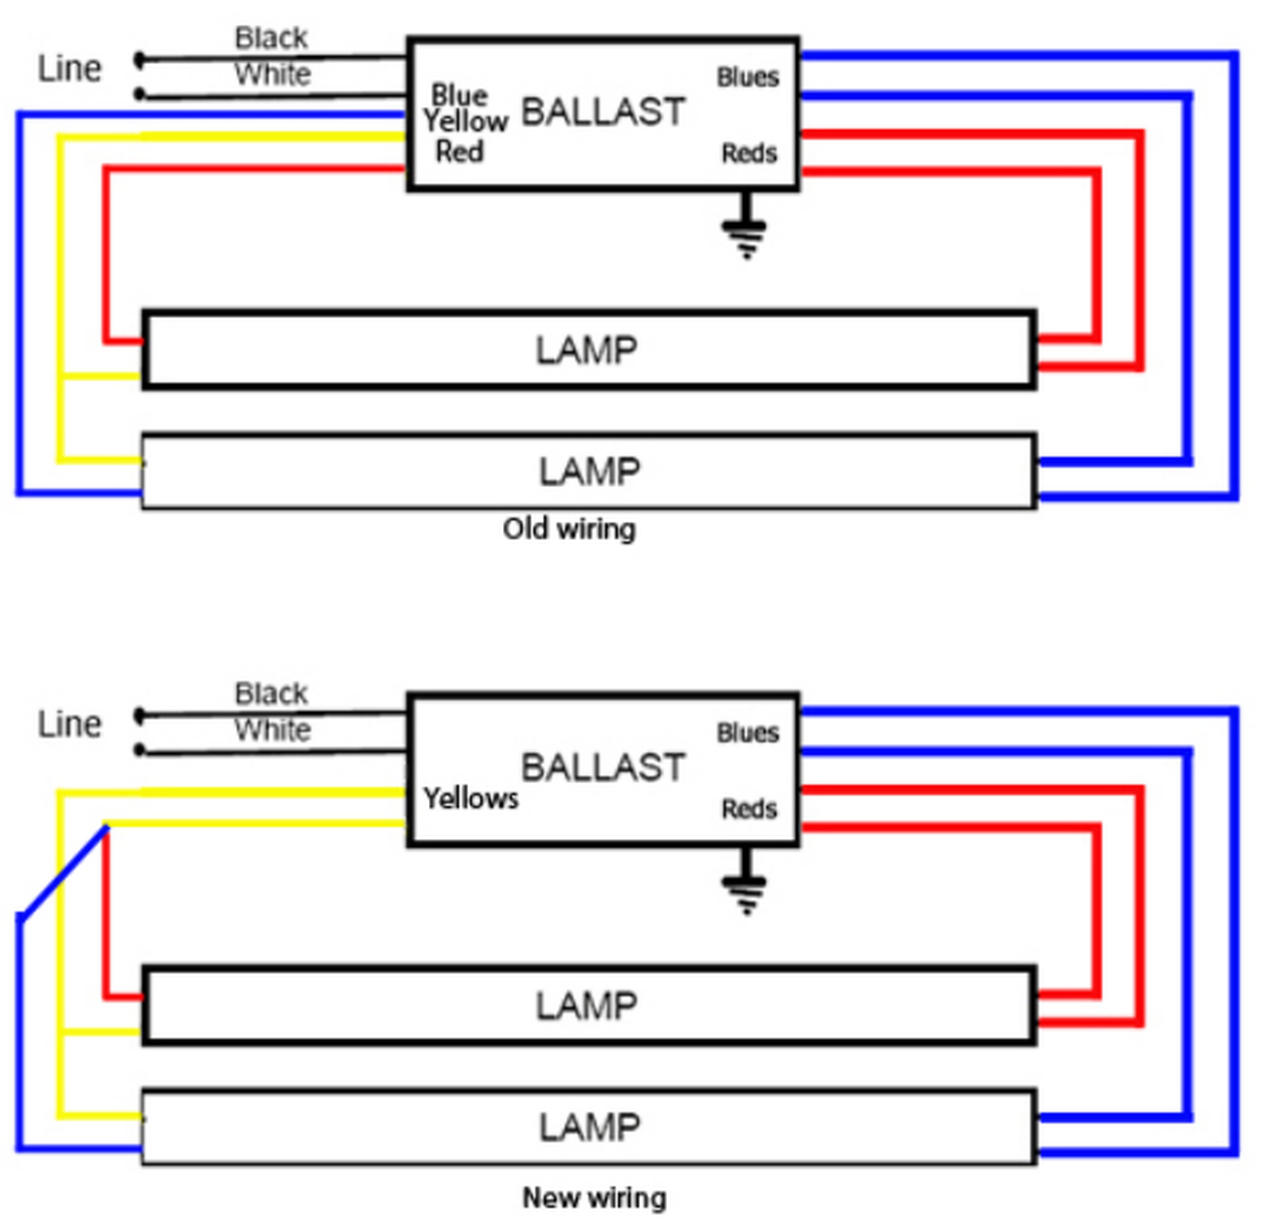 SunPark SL15T Electronic Replacement Ballast | Two Fluorescent Light Fixtures Wiring Diagram |  | BallastShop.com